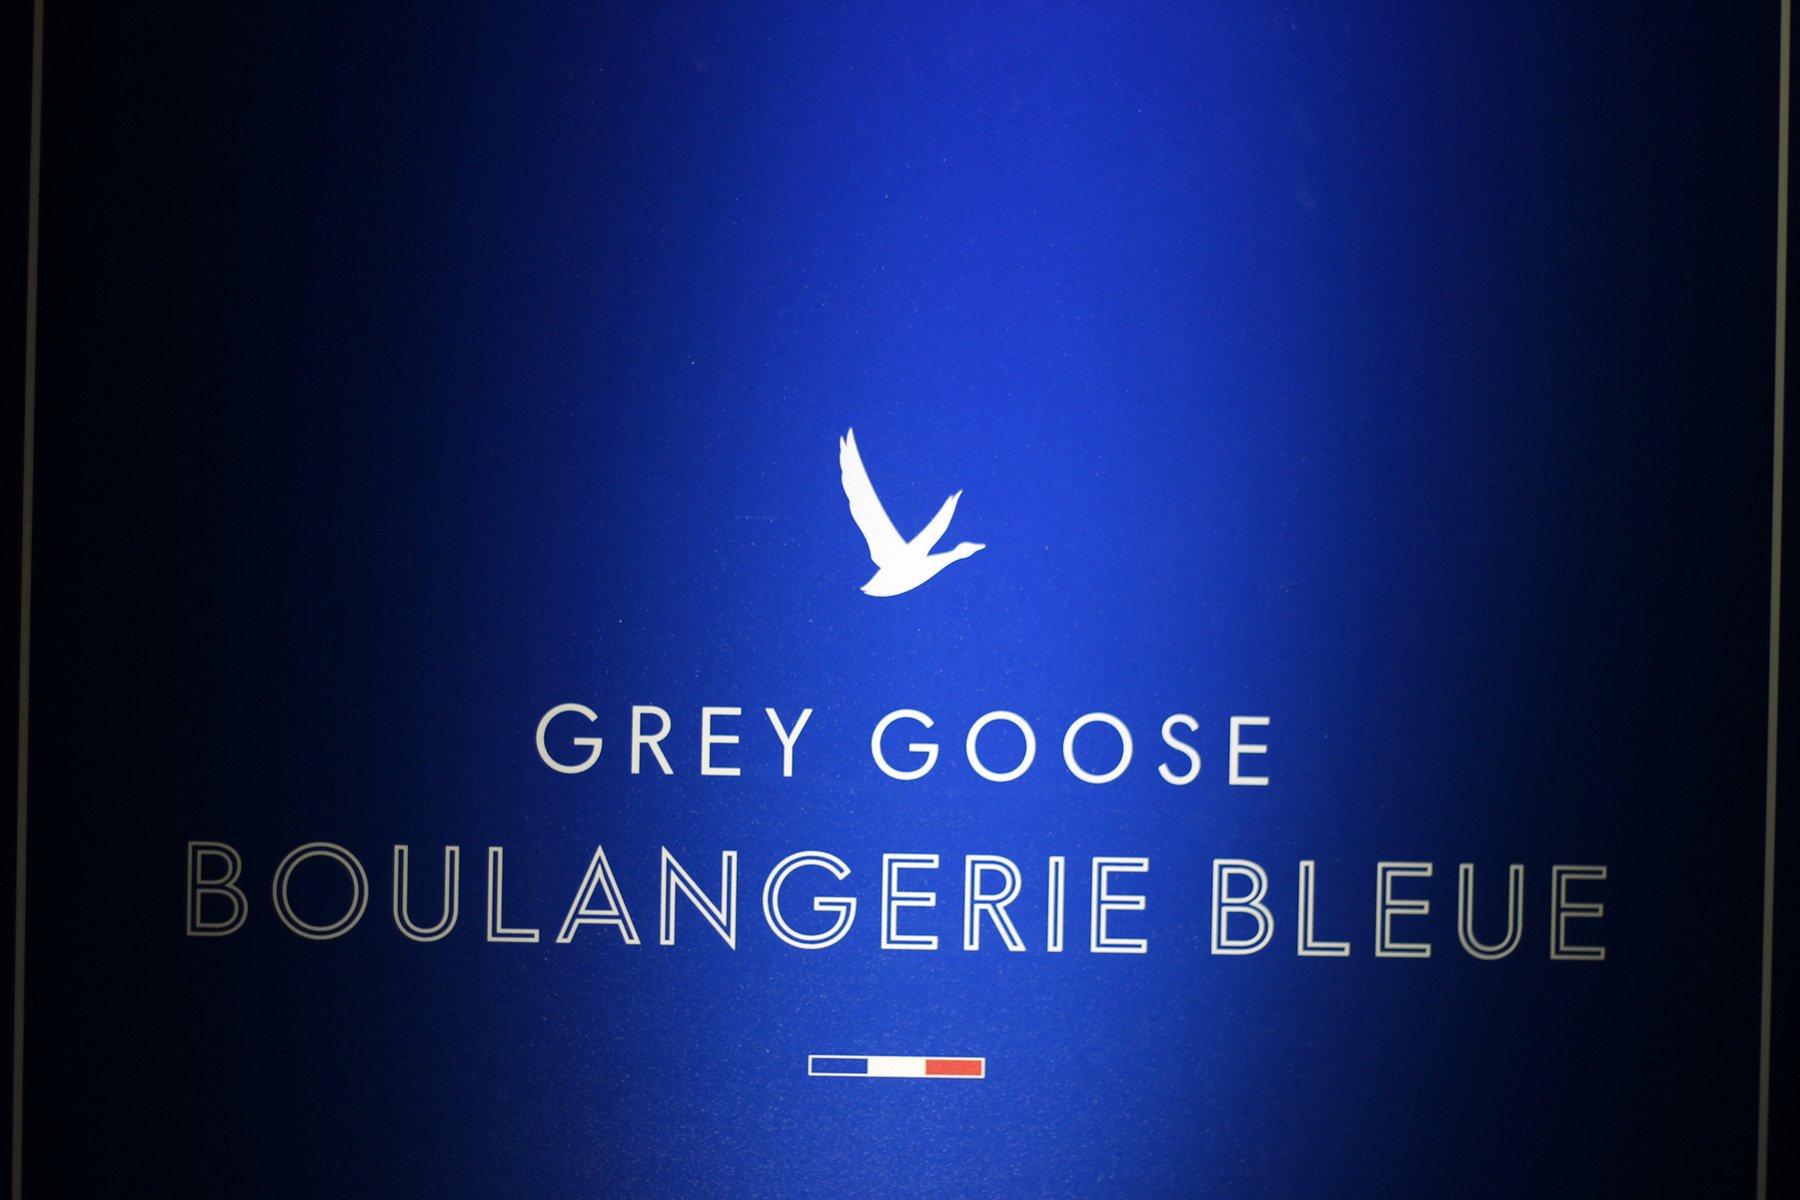 IMG_0461-boulangerie-bleue-licht-connydoll-blog-munichblogger-bavarianblogger